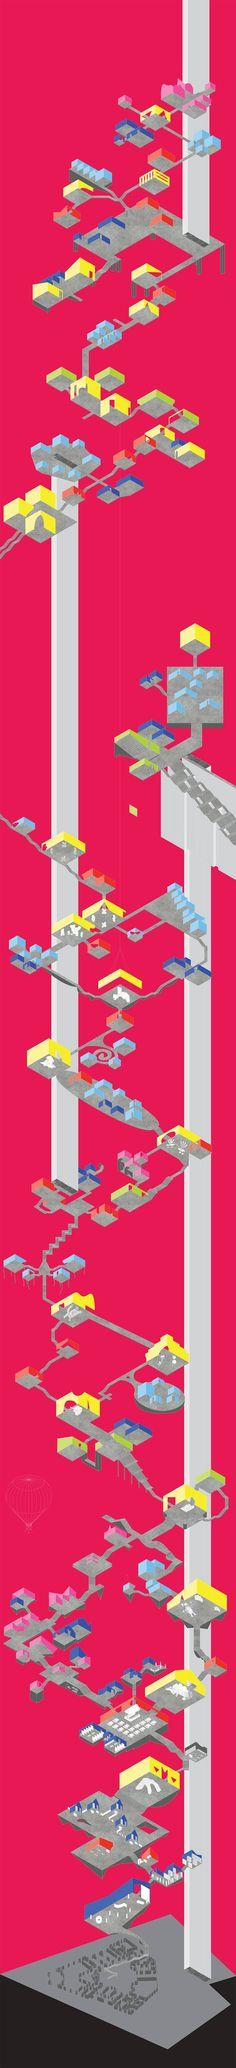 BUREAU SPECTACULAR | a f a s i a presentatie isometrie roze rood grafisch poster circulatie